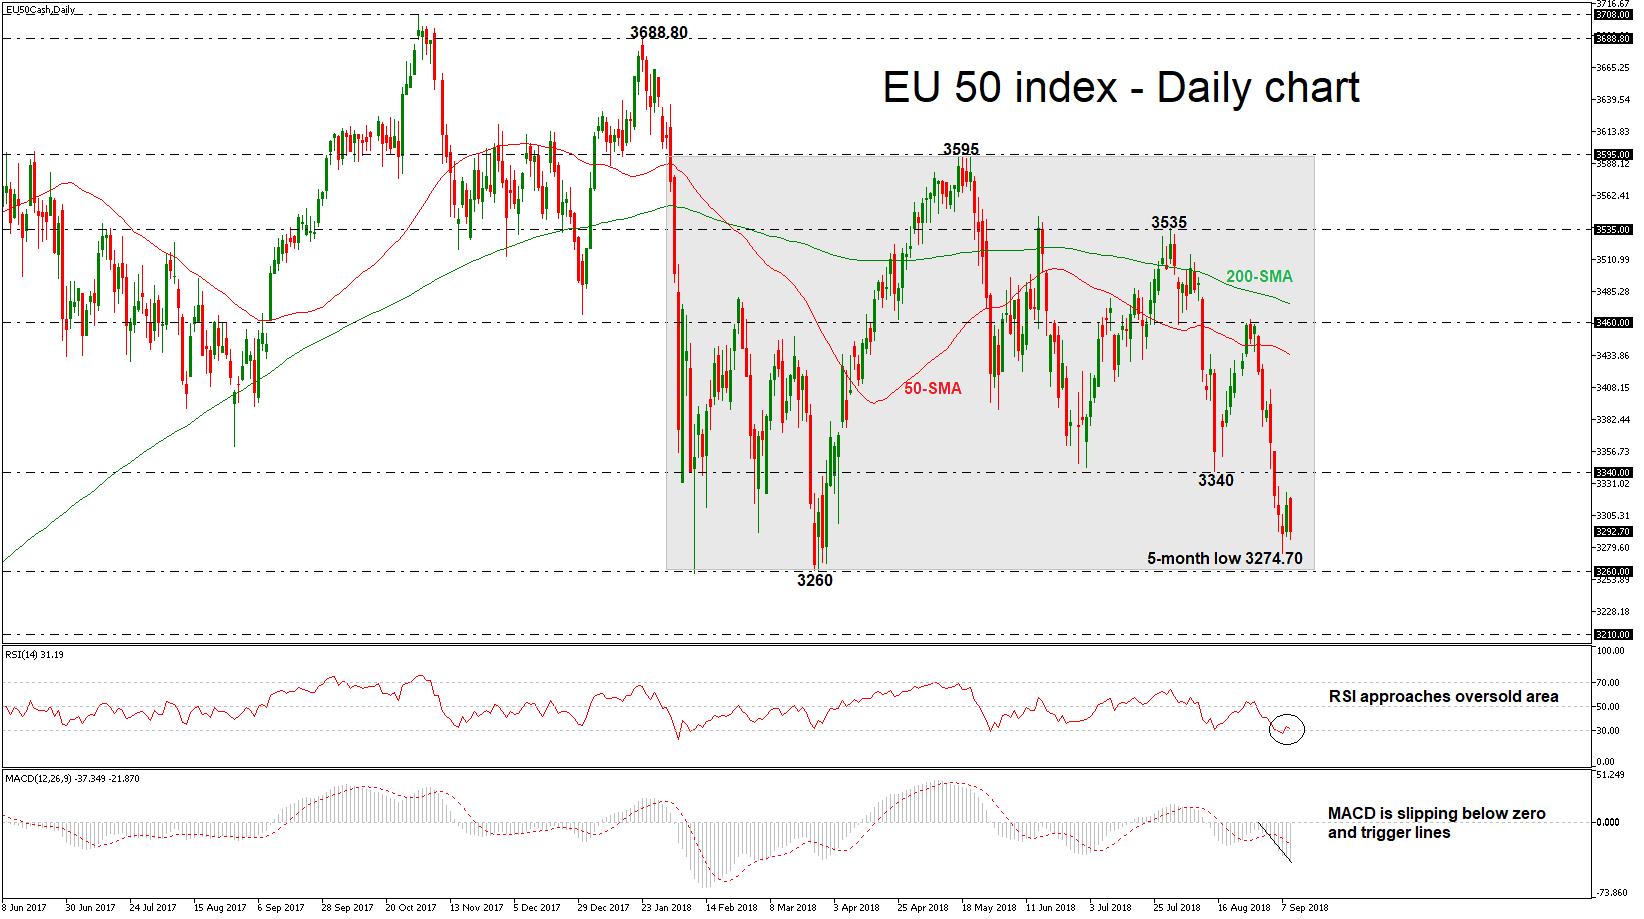 Euro Stoxx 50 11/09/18   EconAlerts